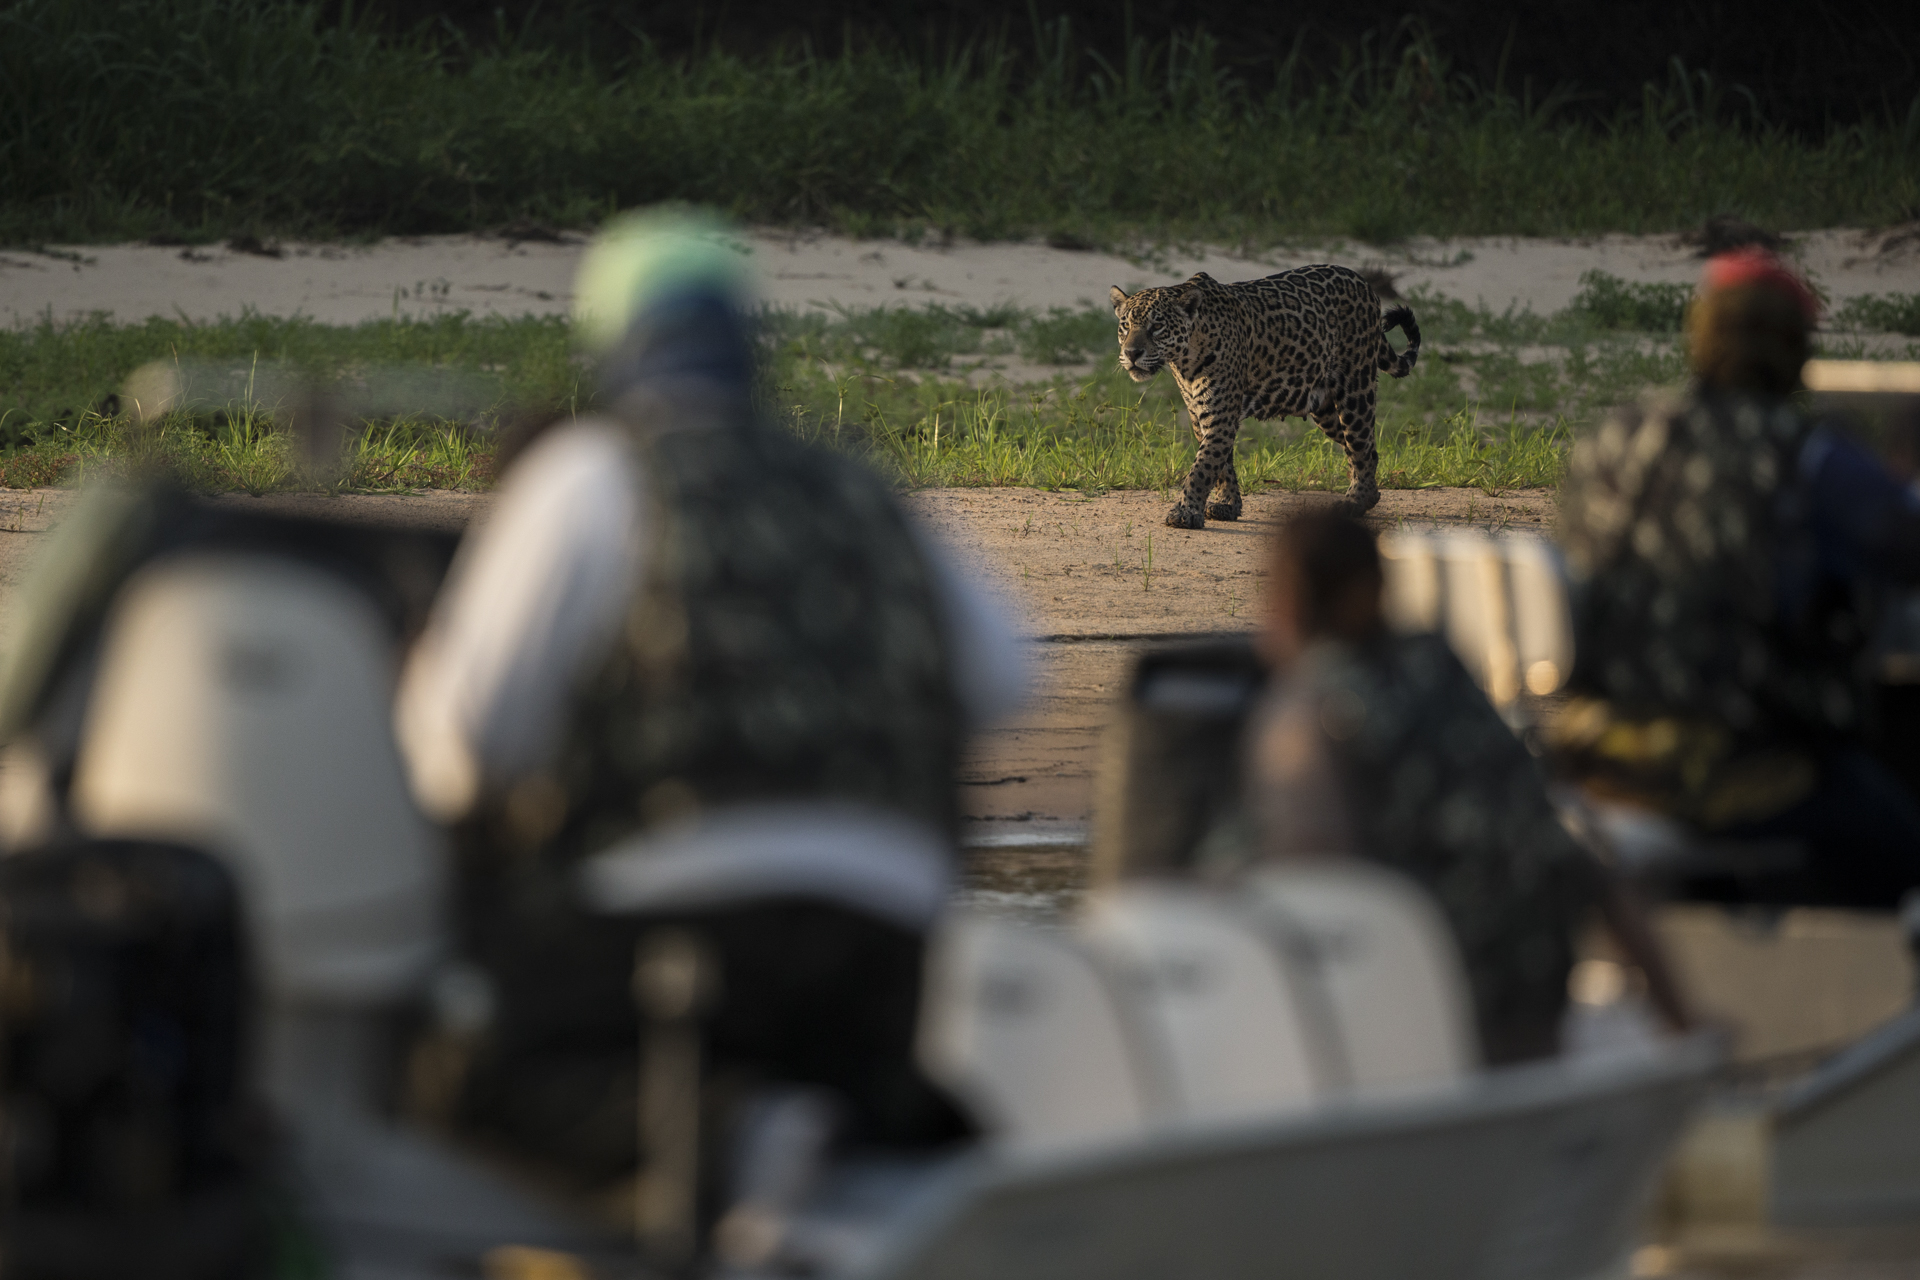 Jaguar tourism is a huge draw generating millions of dollars per year.